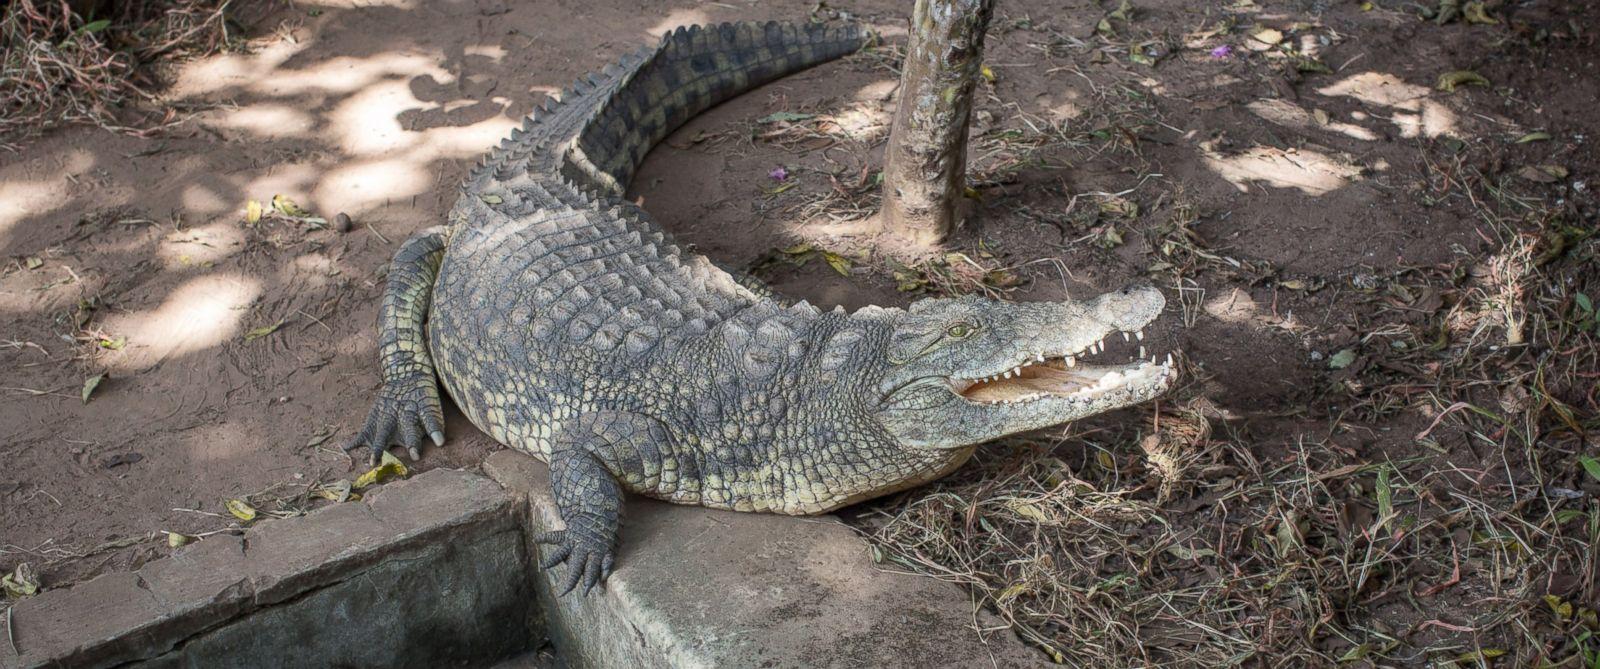 Crocodiles Sex 45